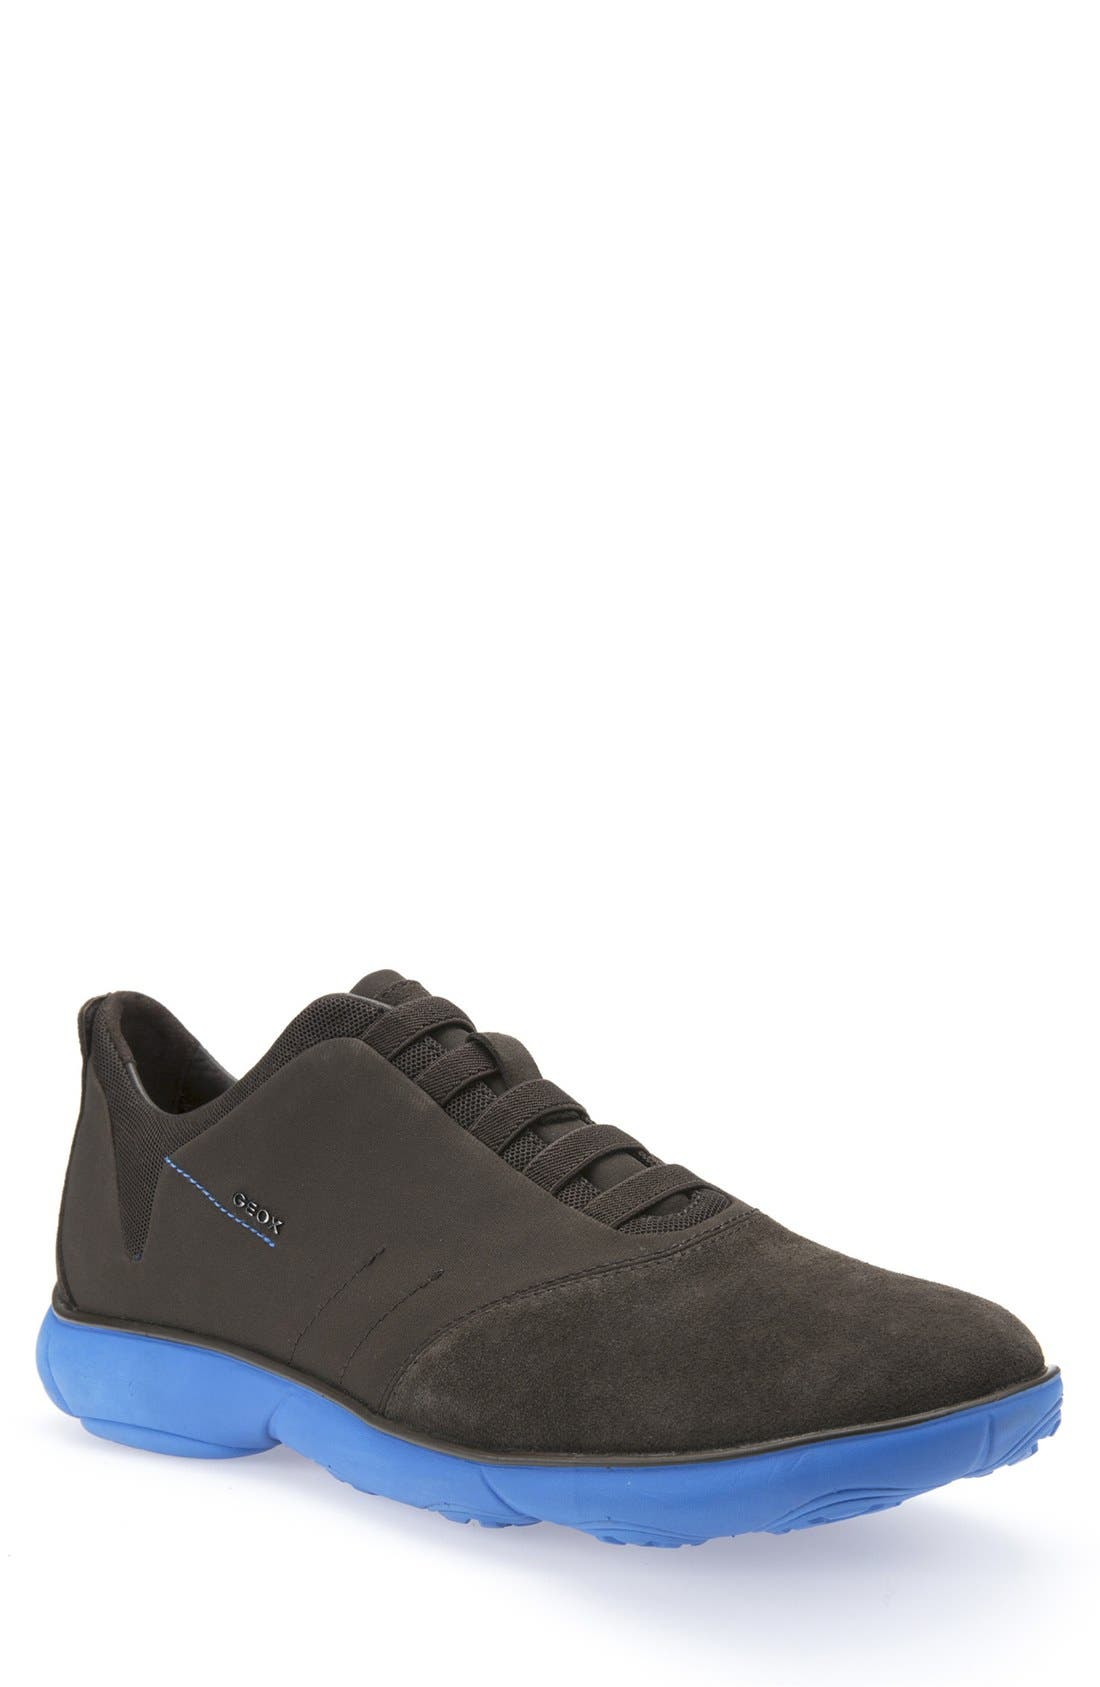 Alternate Image 1 Selected - Geox 'Nebula 24' Slip-On Sneaker (Men)